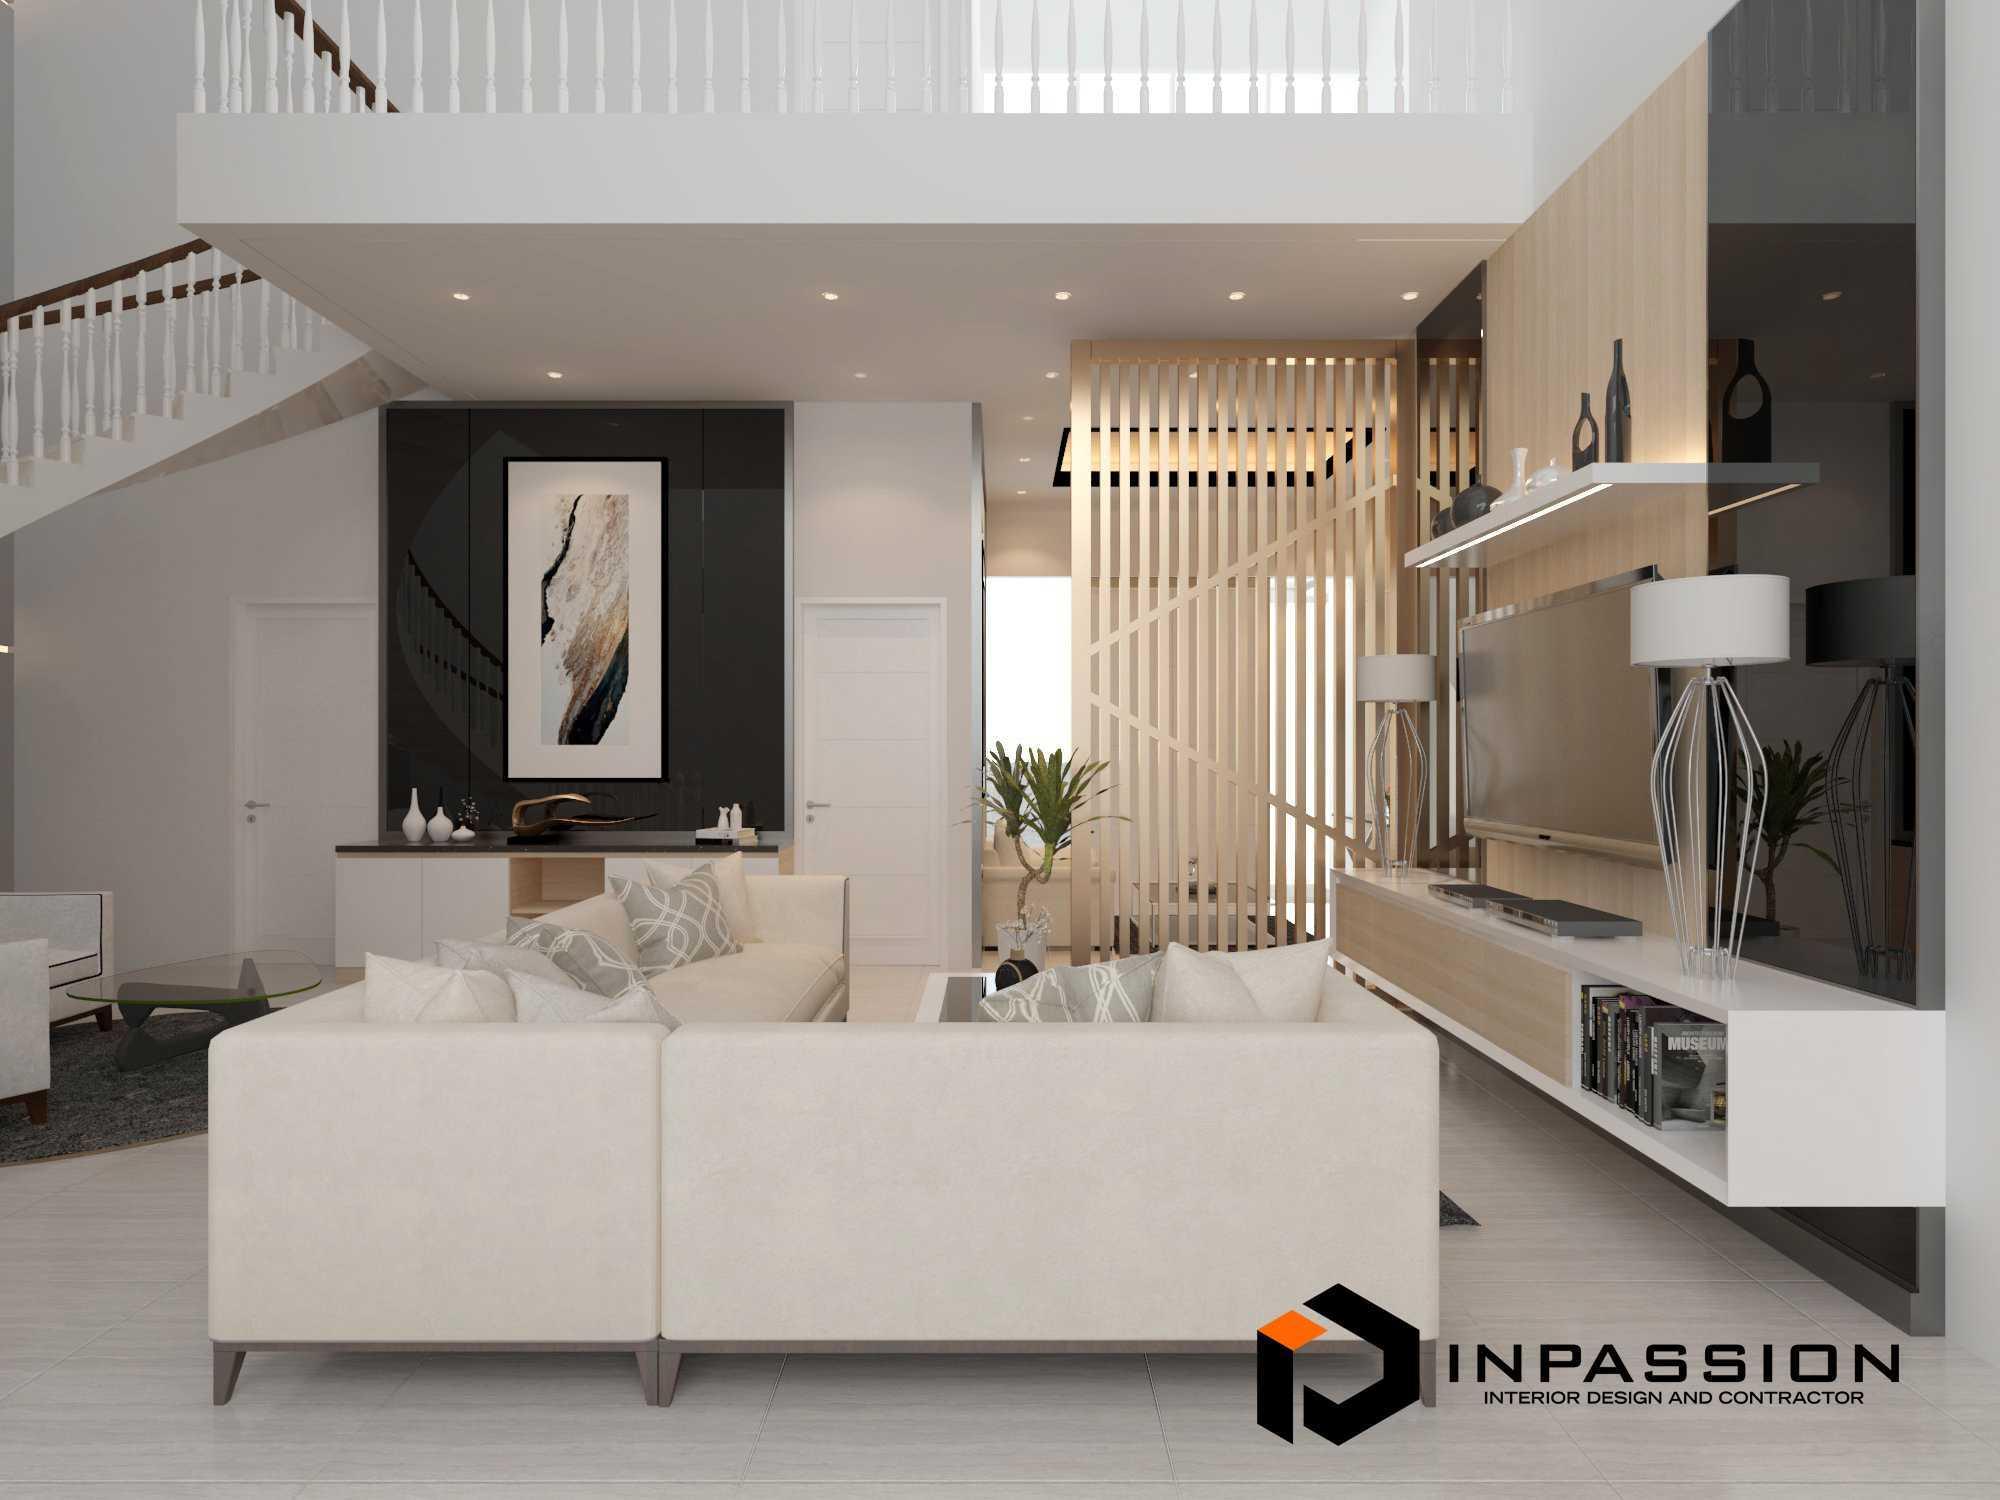 Inpassion Interior Design Rumah Margorejo Surabaya, Kota Sby, Jawa Timur, Indonesia Surabaya, Kota Sby, Jawa Timur, Indonesia Inpassion-Interior-Design-Rumah-Margorejo  80807